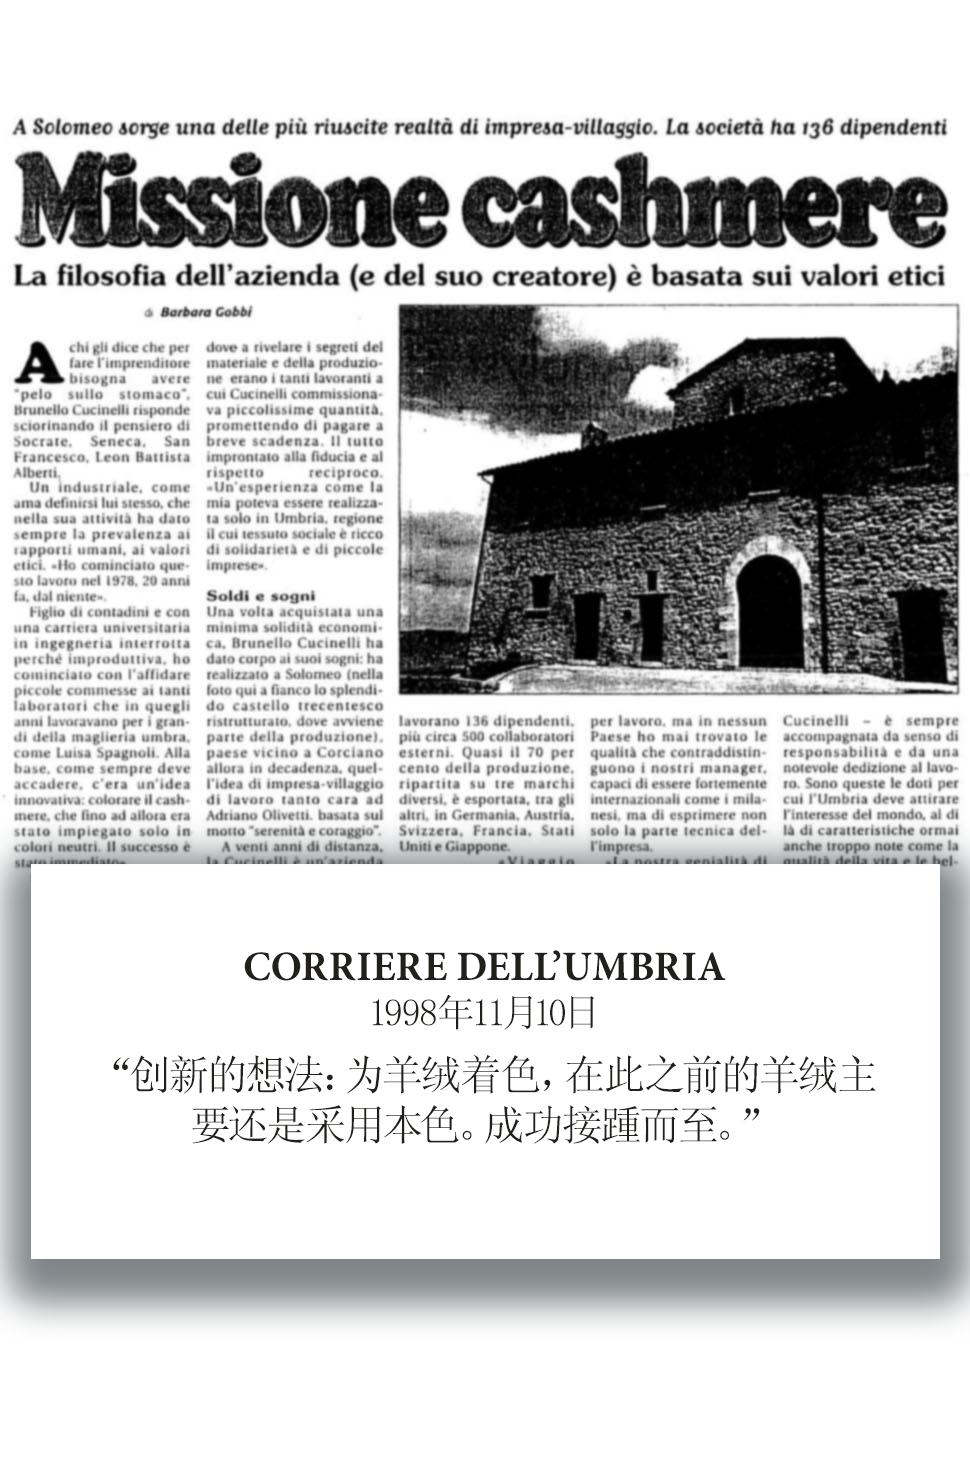 1998 Corriere dell'Umbria